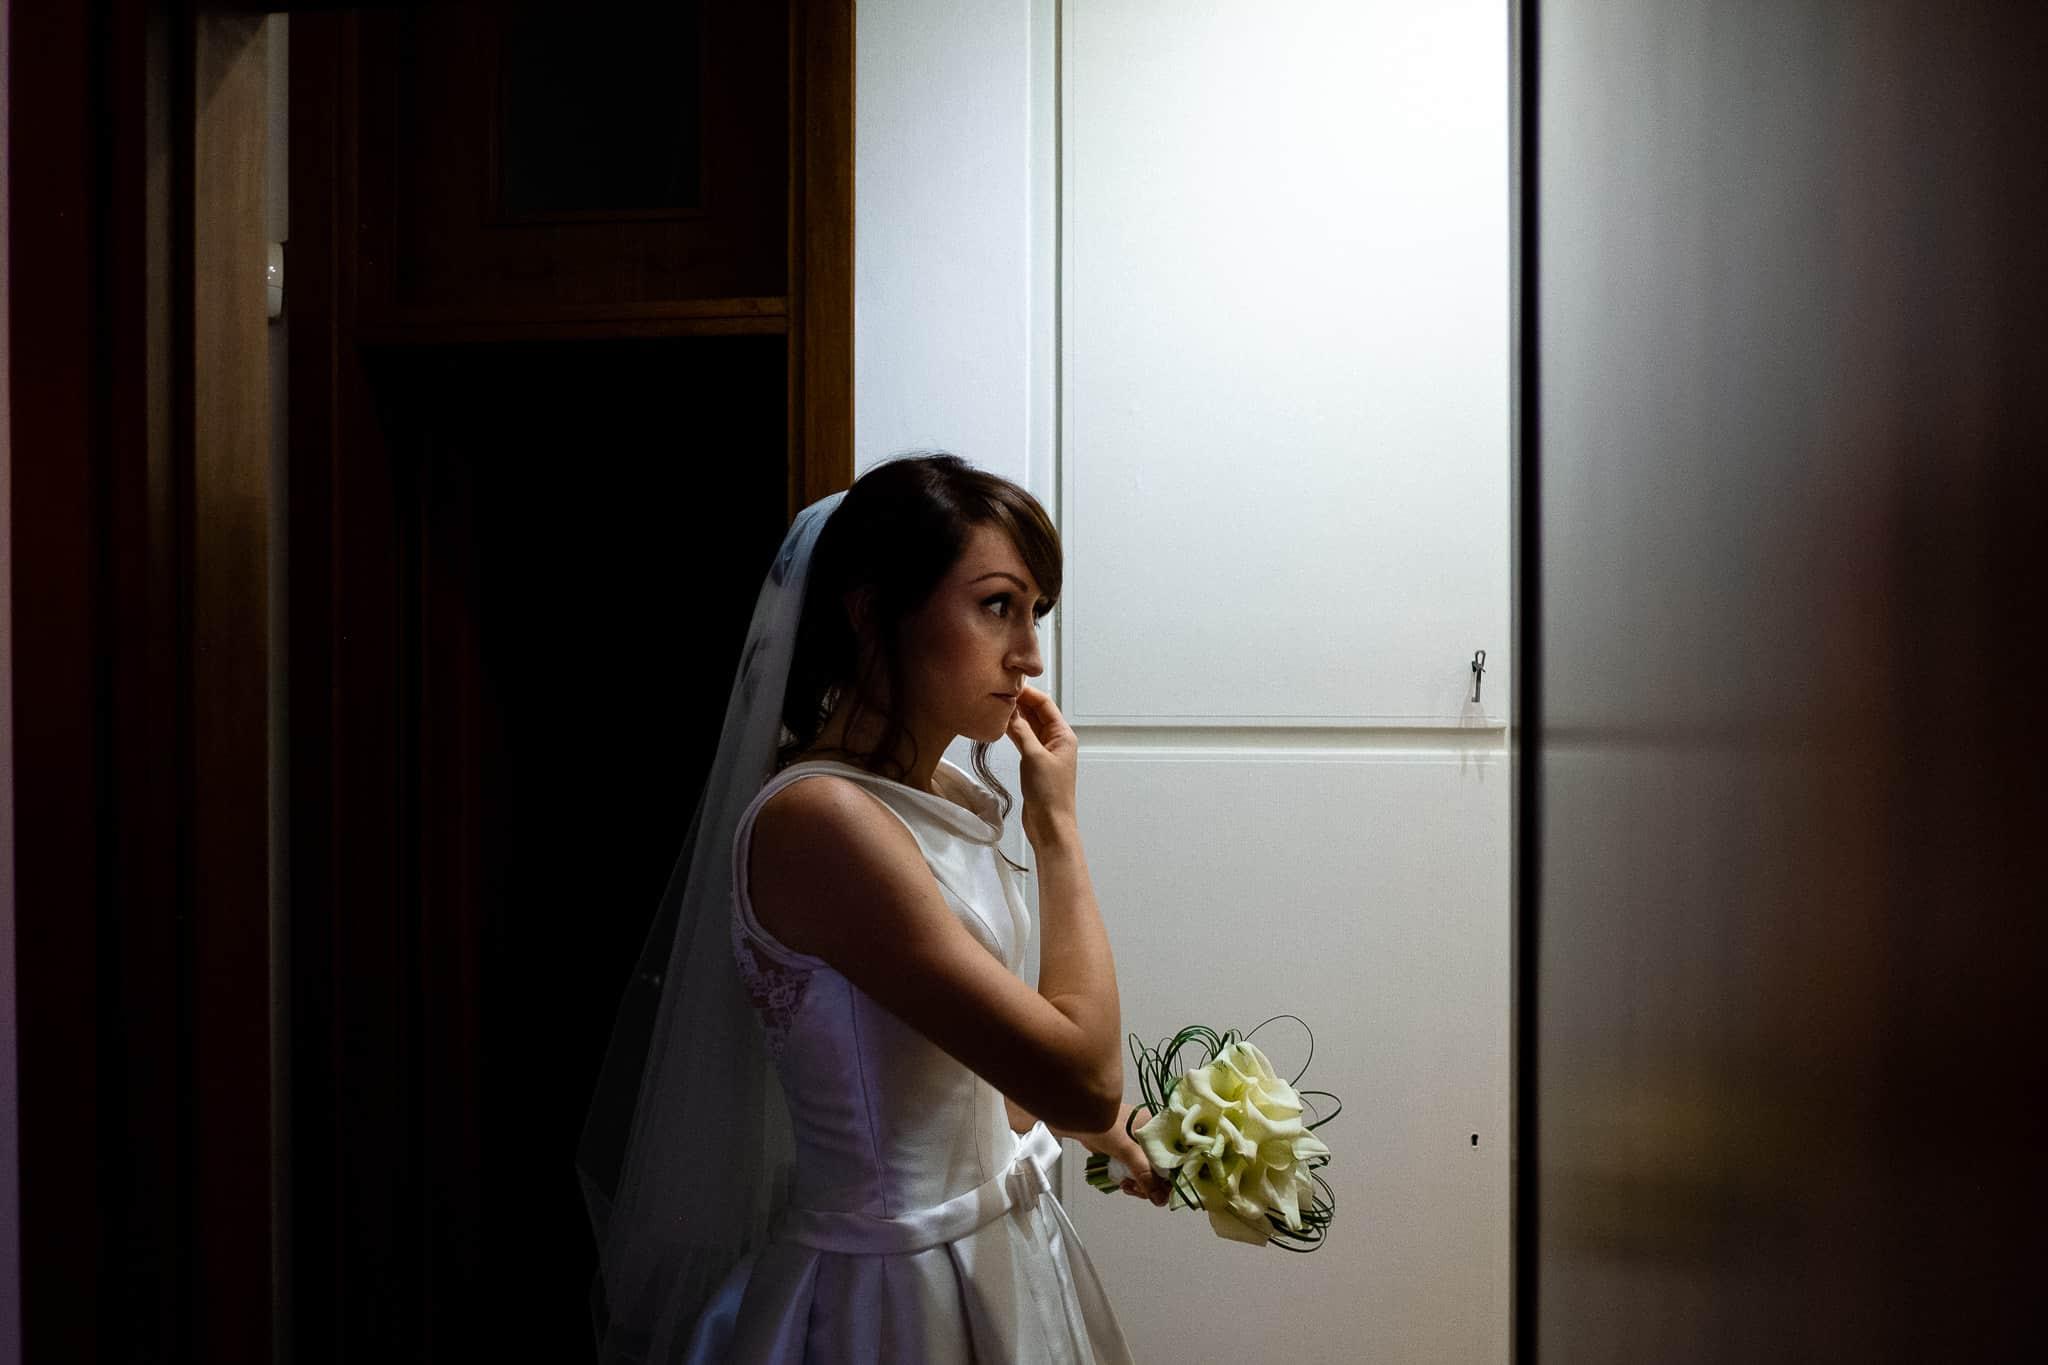 matrimonio Canter Milano San siro Luca rossi wedding reportage 0021